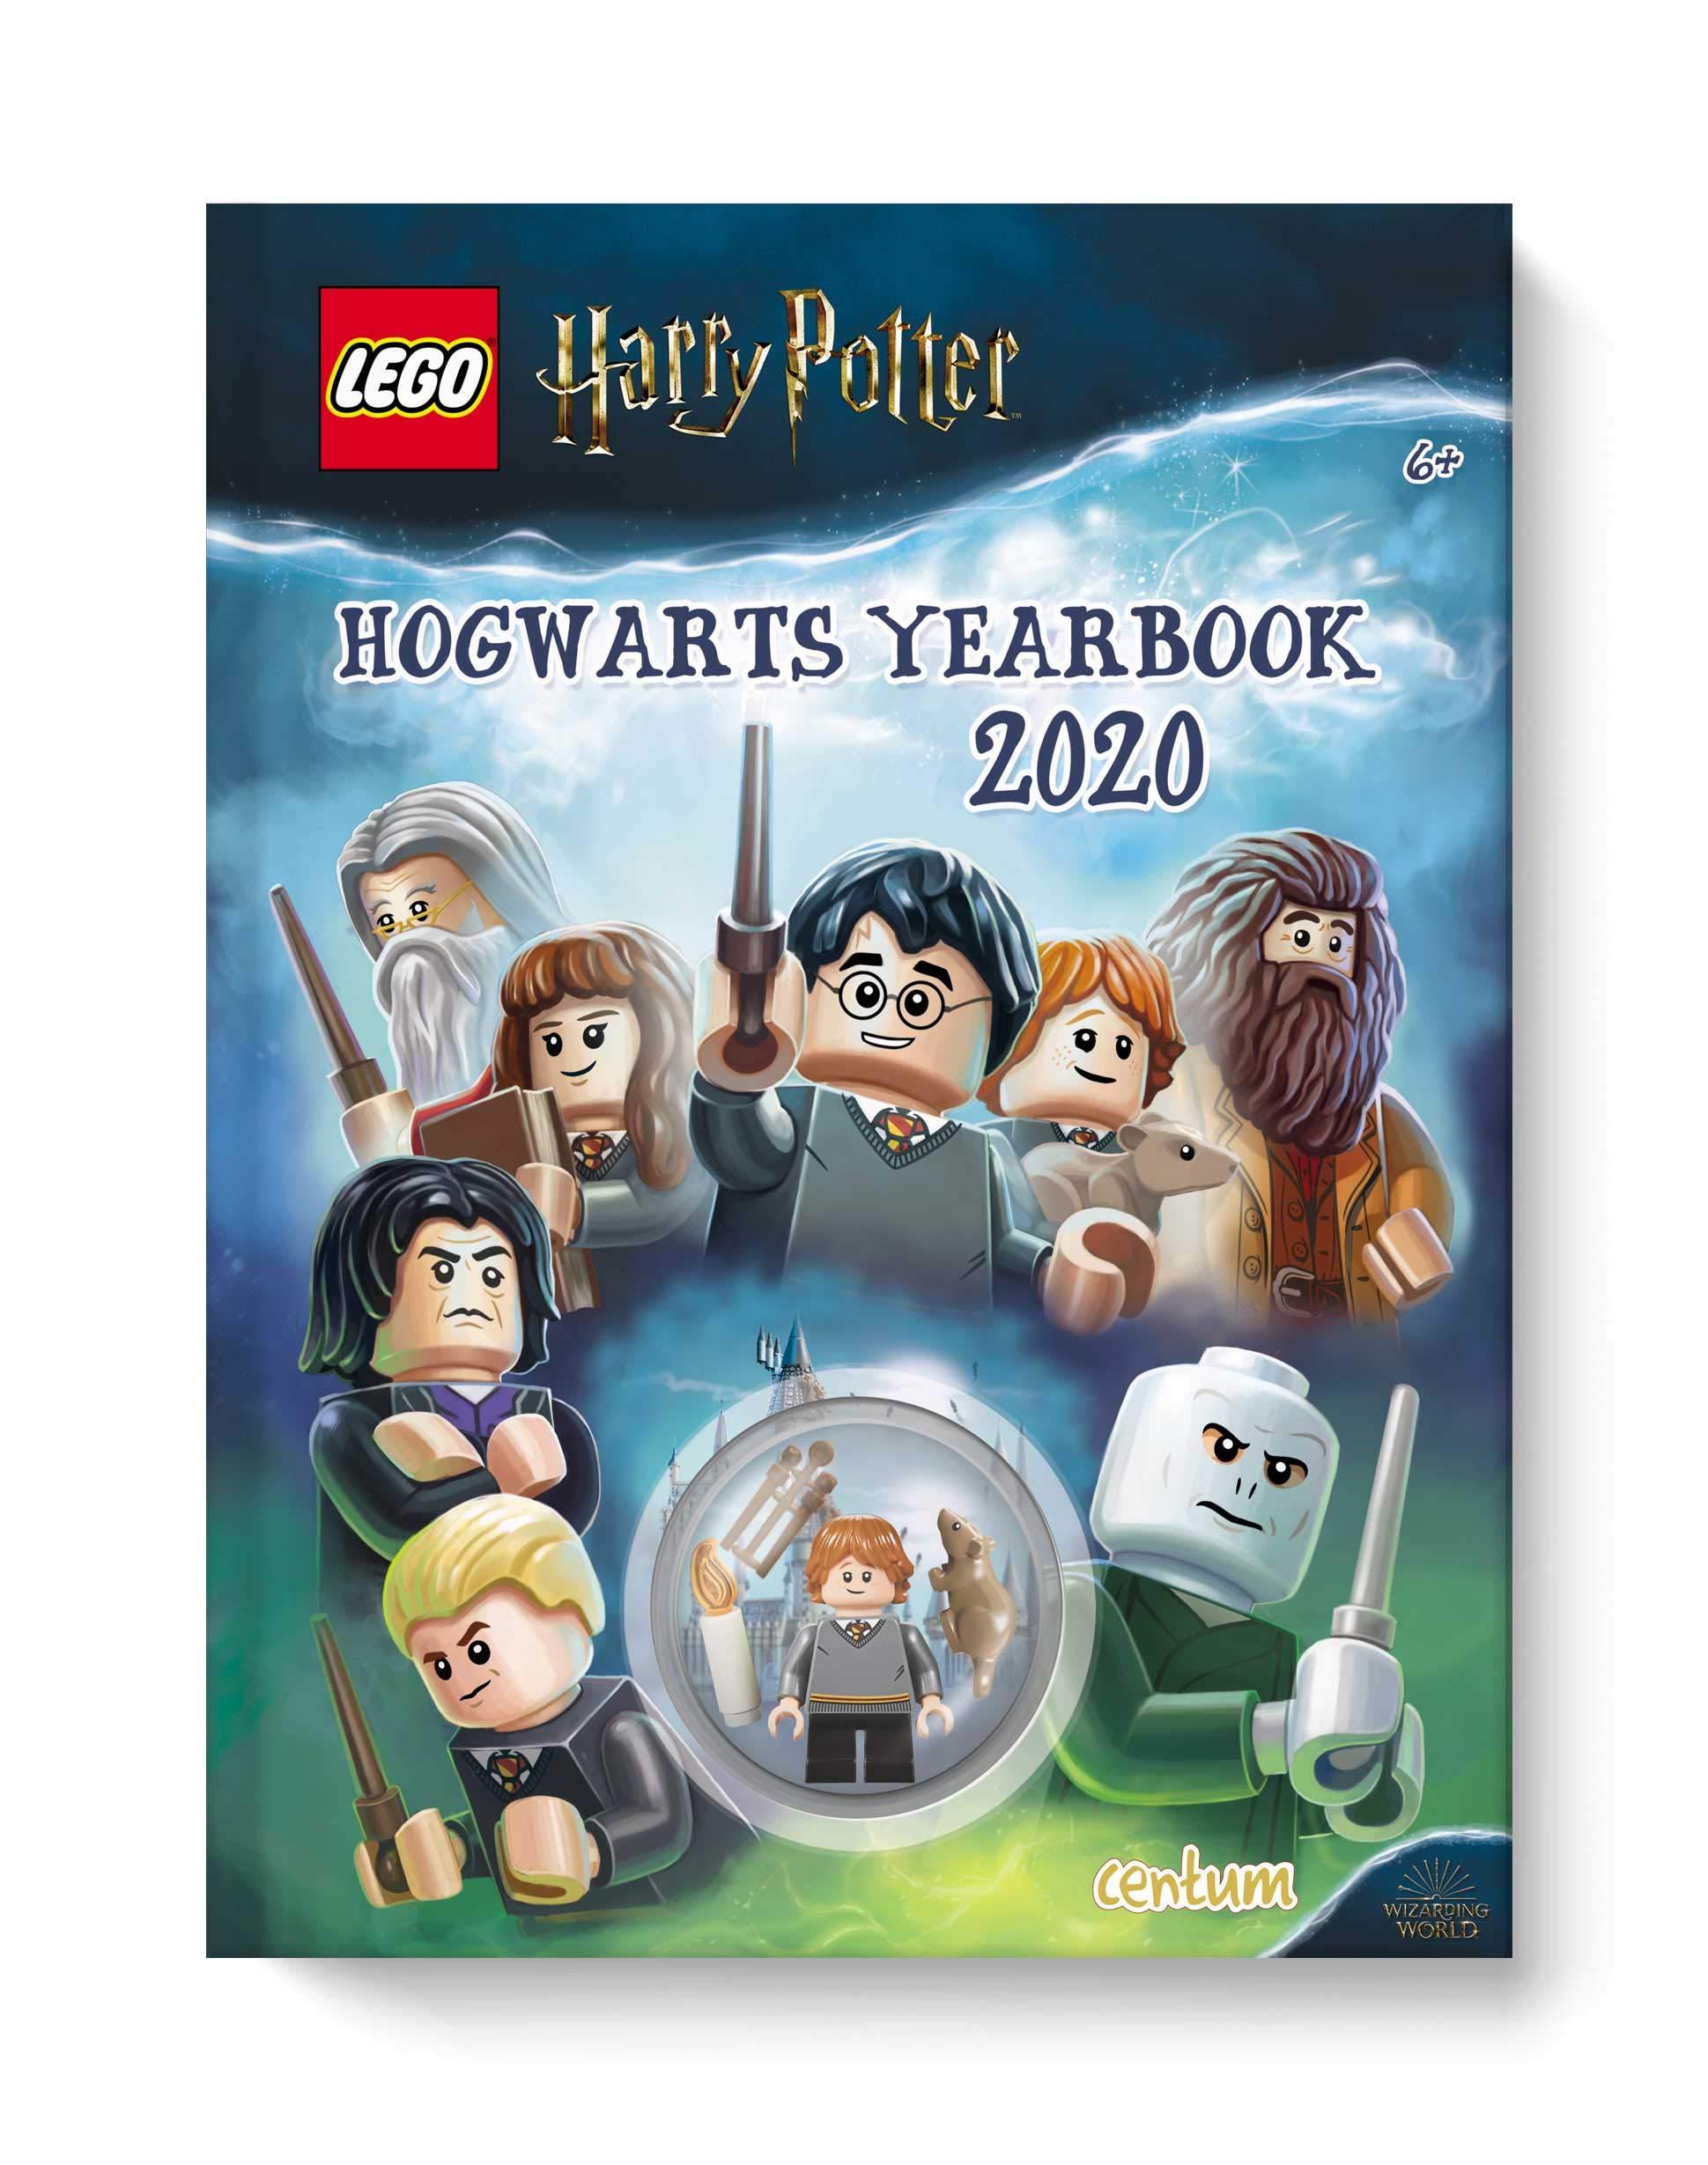 Lego Harry Potter Hogwarts Yearbook 2020: Amazon.es: Centum ...